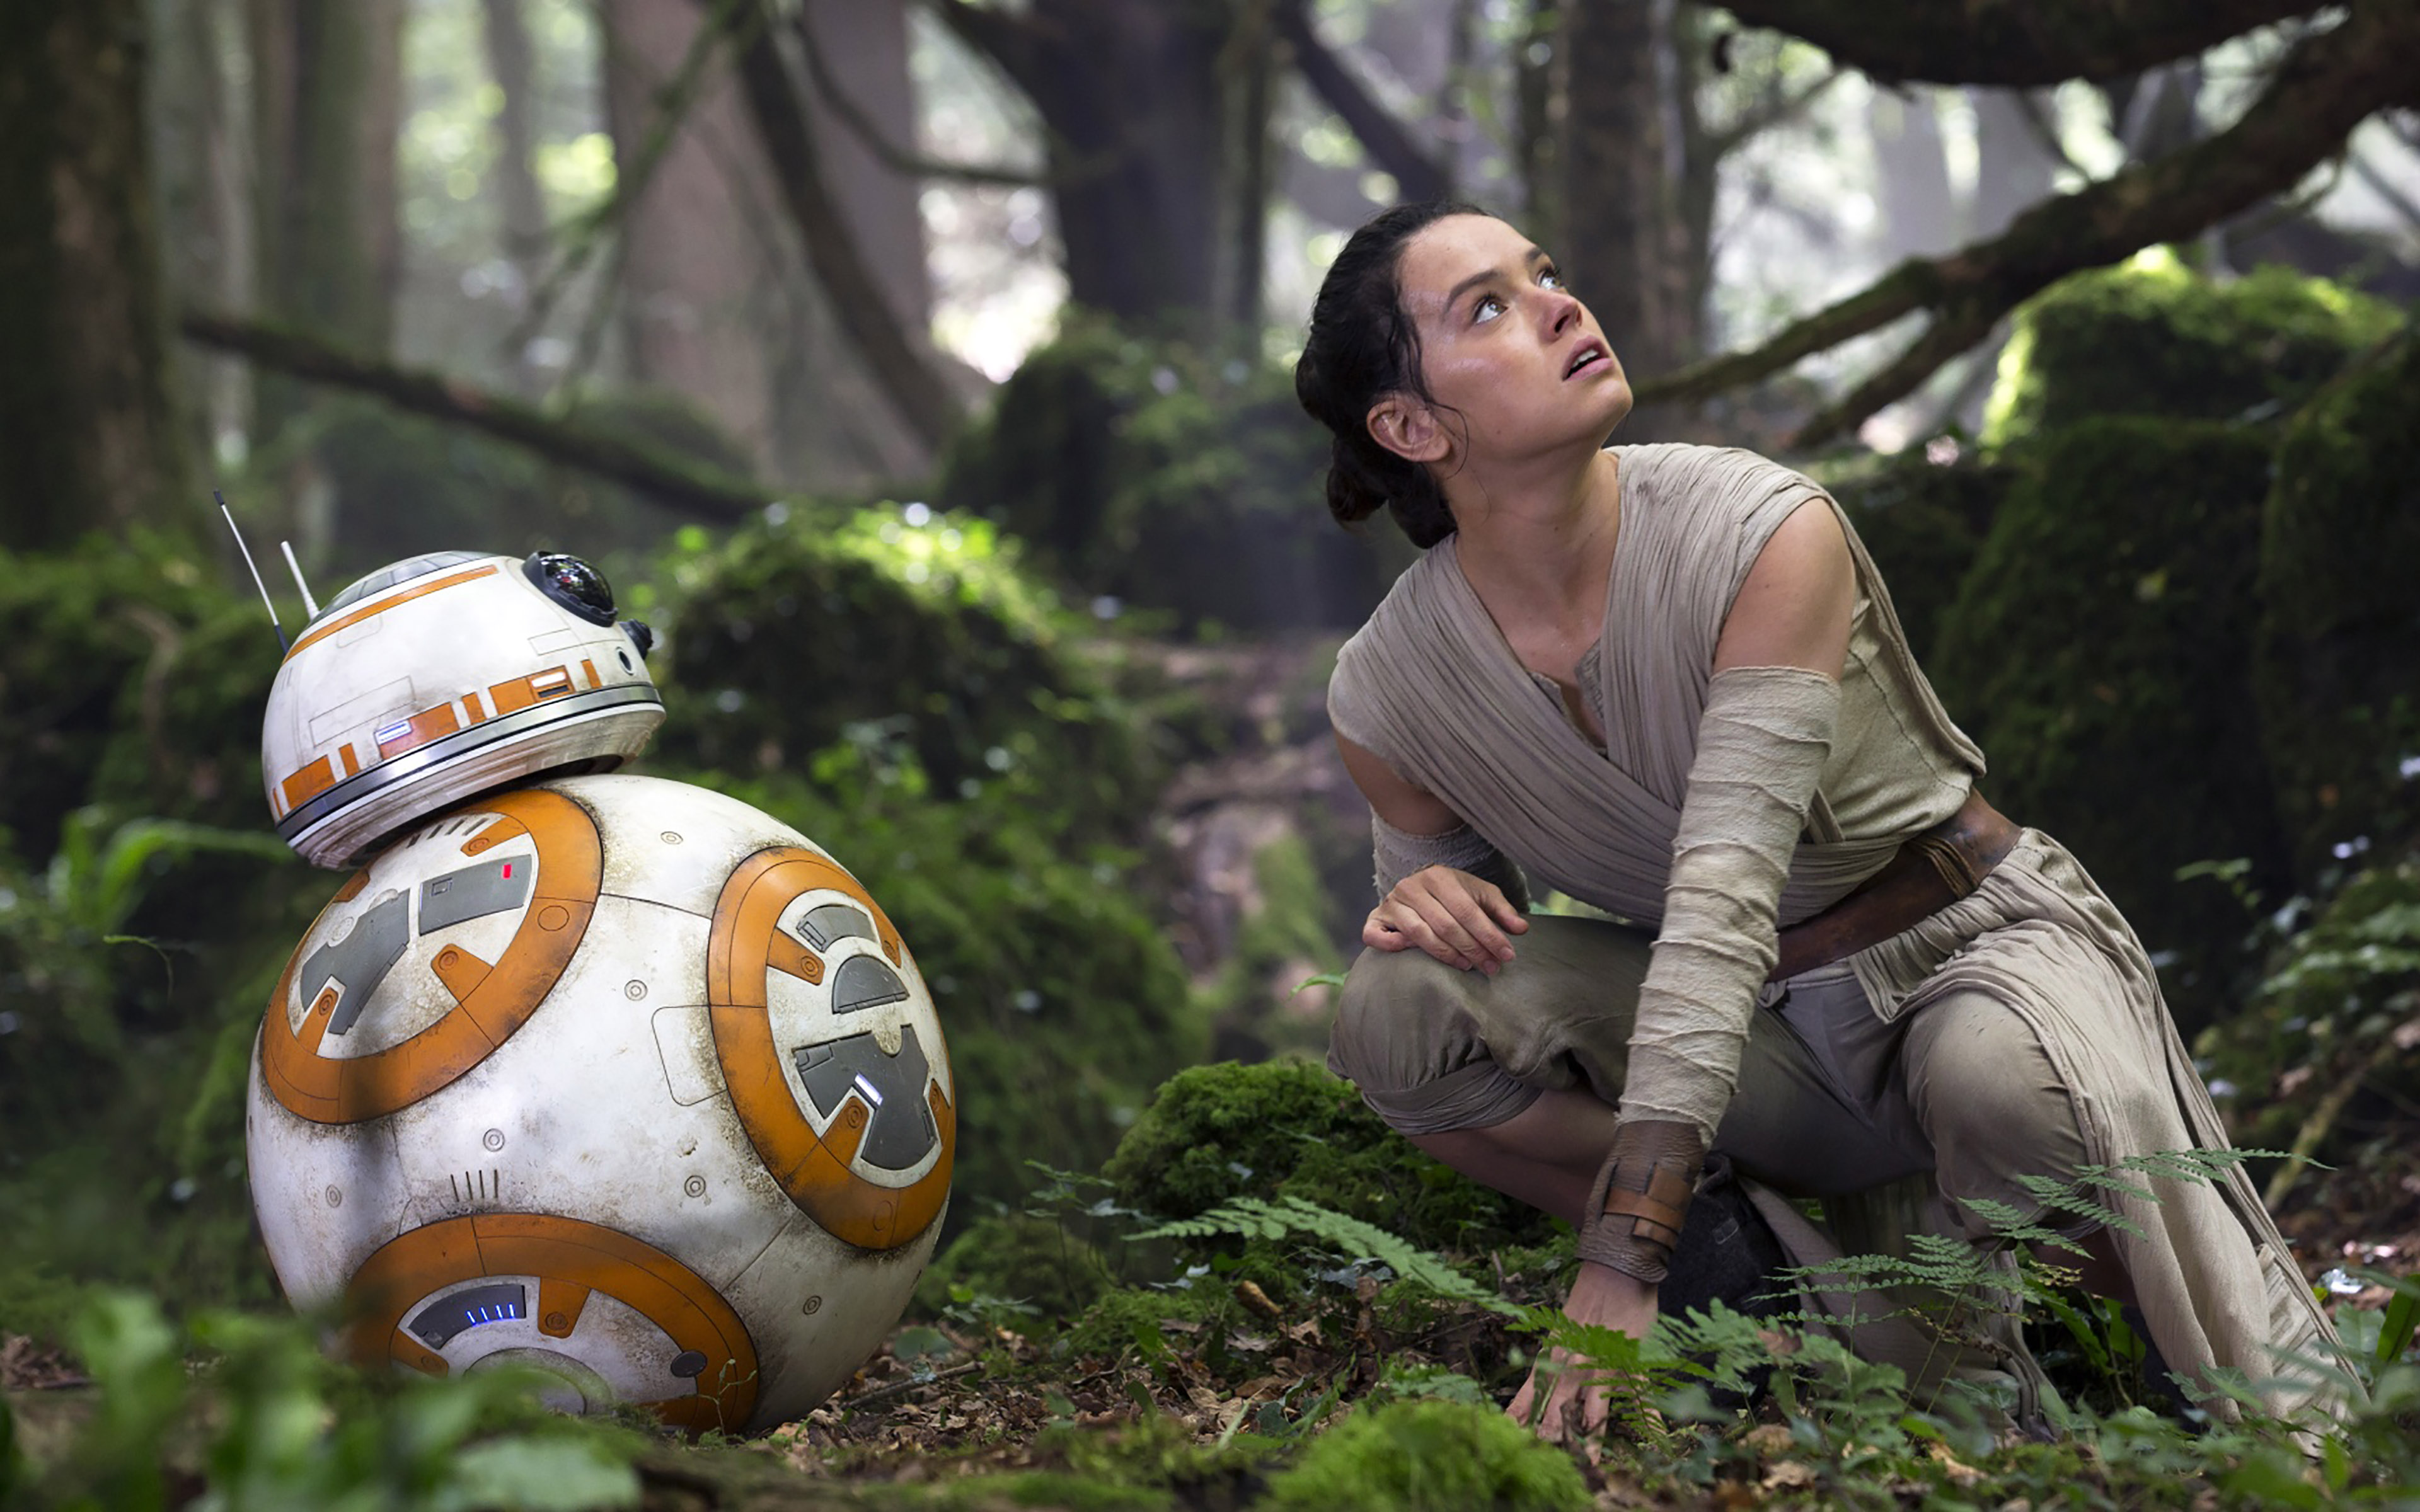 BB8 Rey Star Wars The Force Awakens Movie Wallpaper WallpapersByte 3840x2400